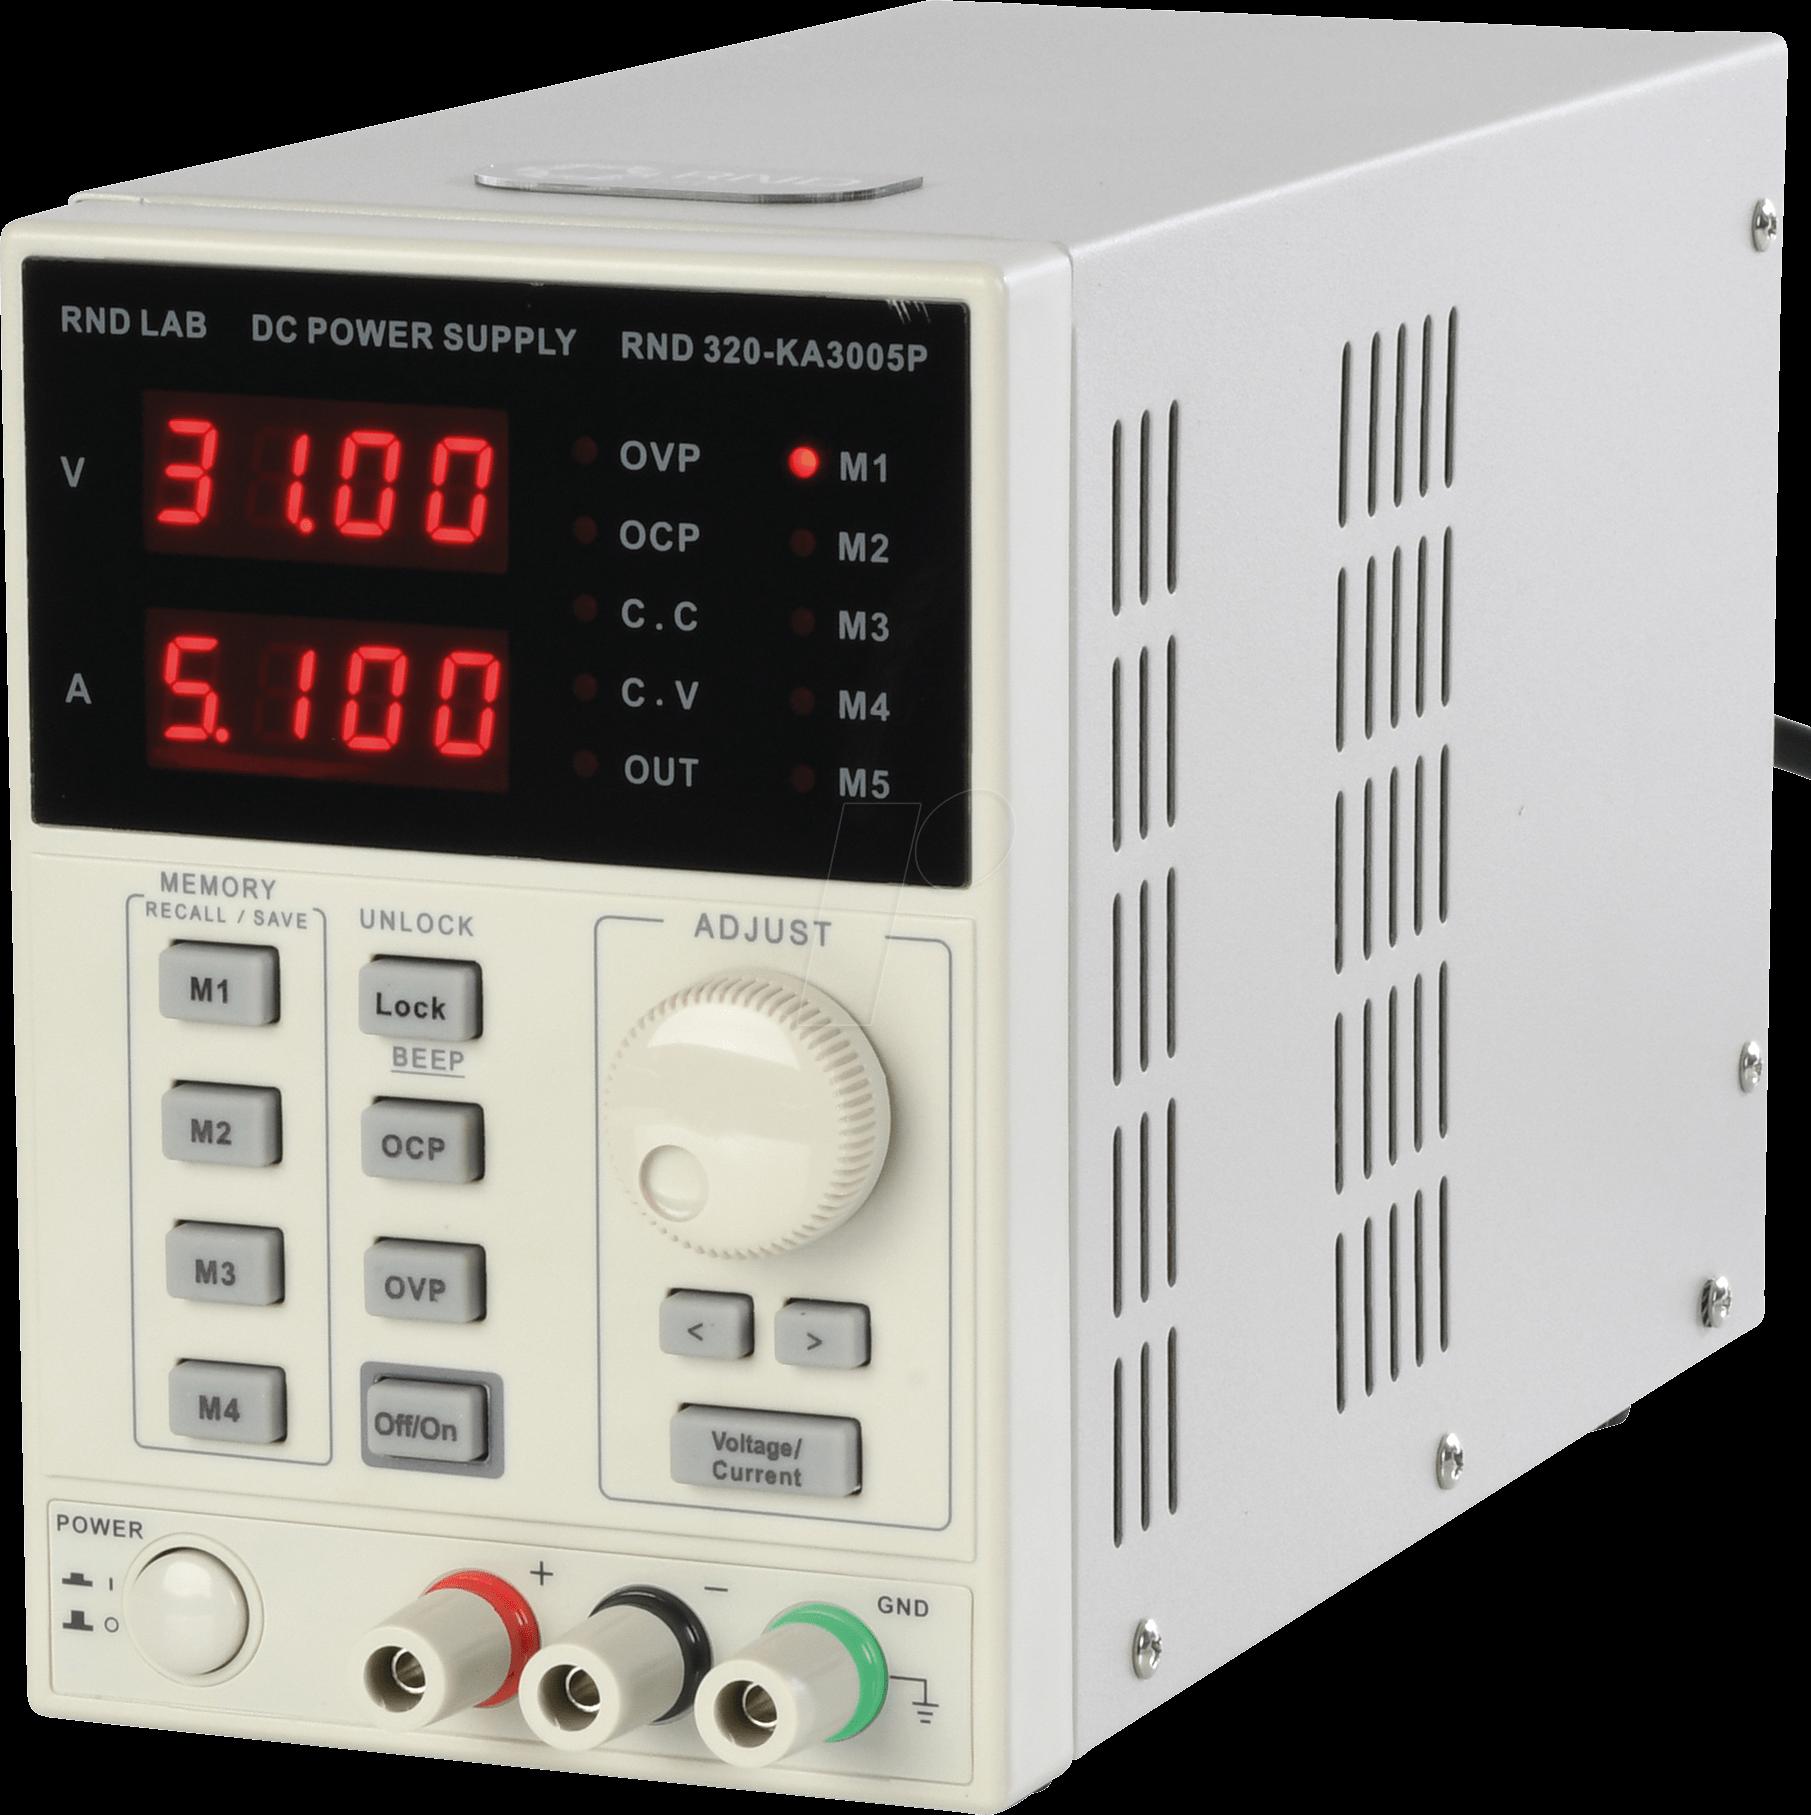 RND 320-KA3005P - Labornetzgerät, 0 - 30 V, 0 - 5 A, stabilisiert, programmierbar